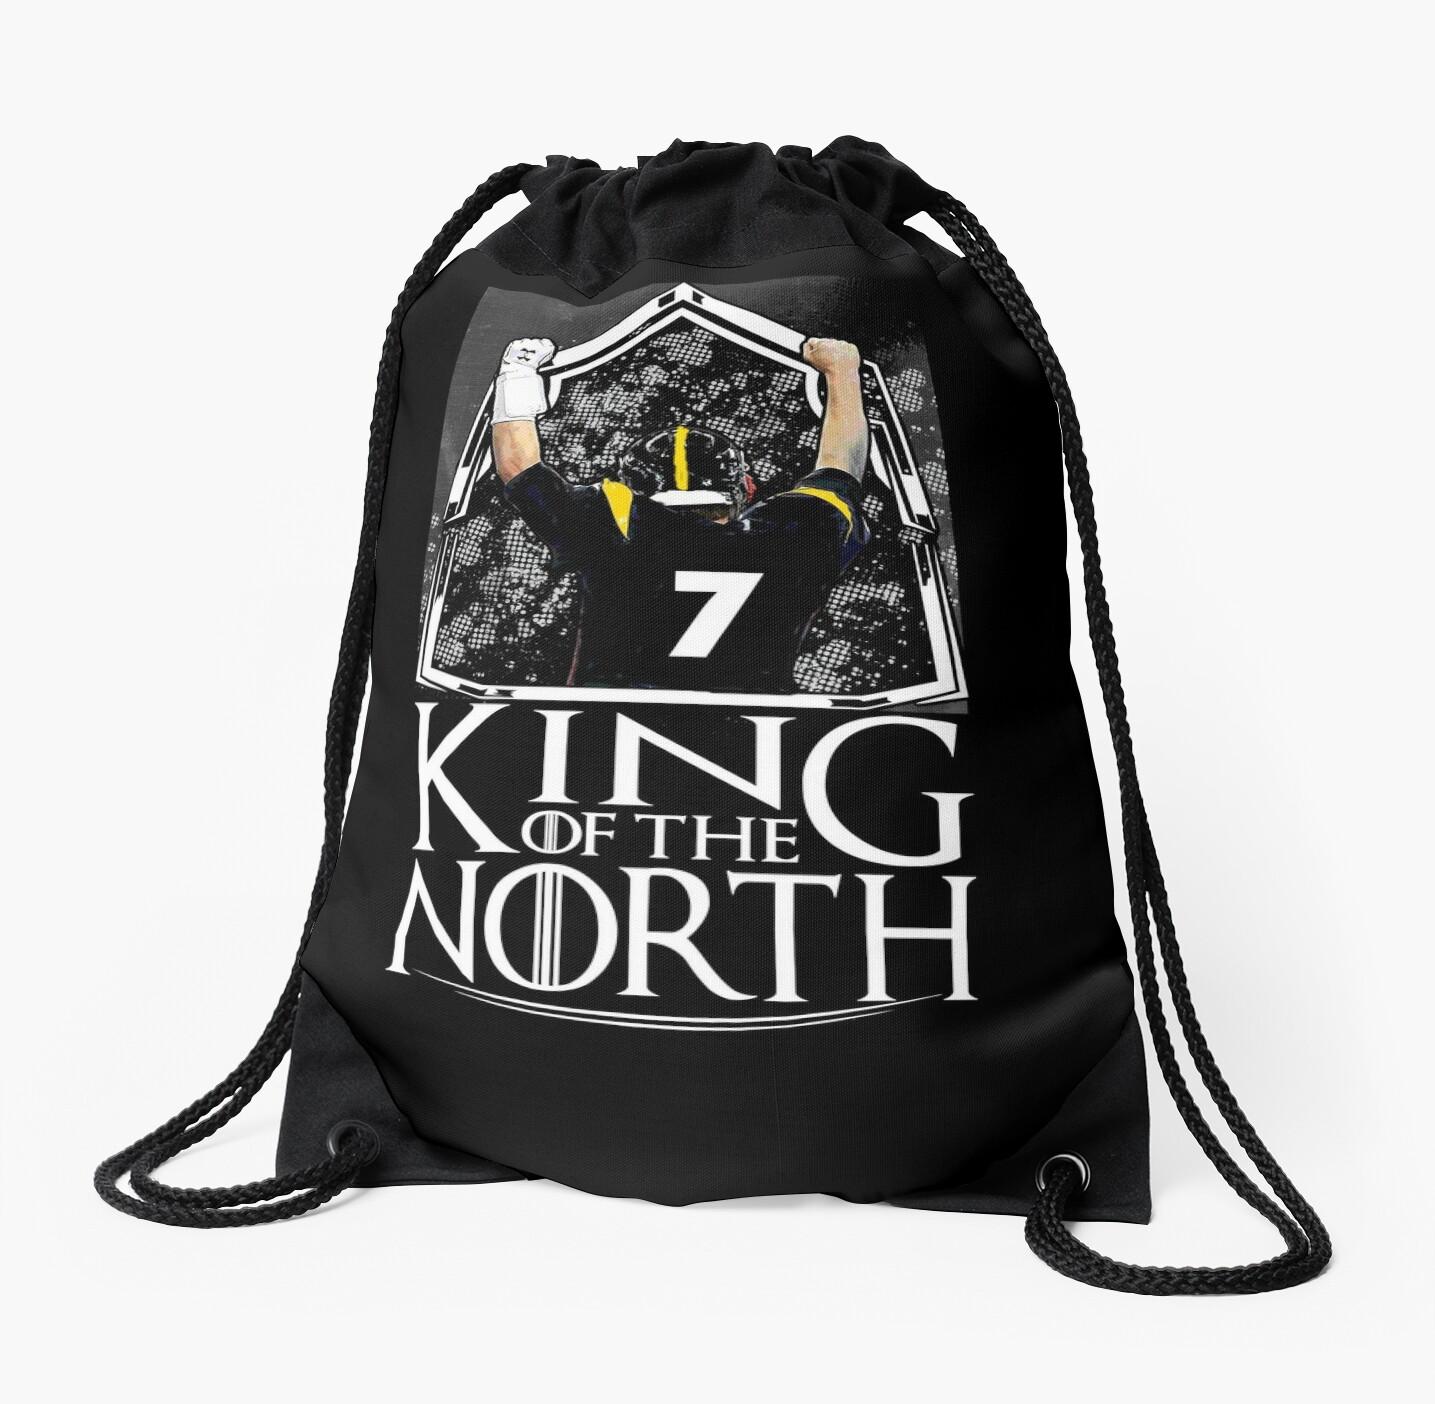 Ben Roethlisberger King The North Pittsburgh Steelers Football